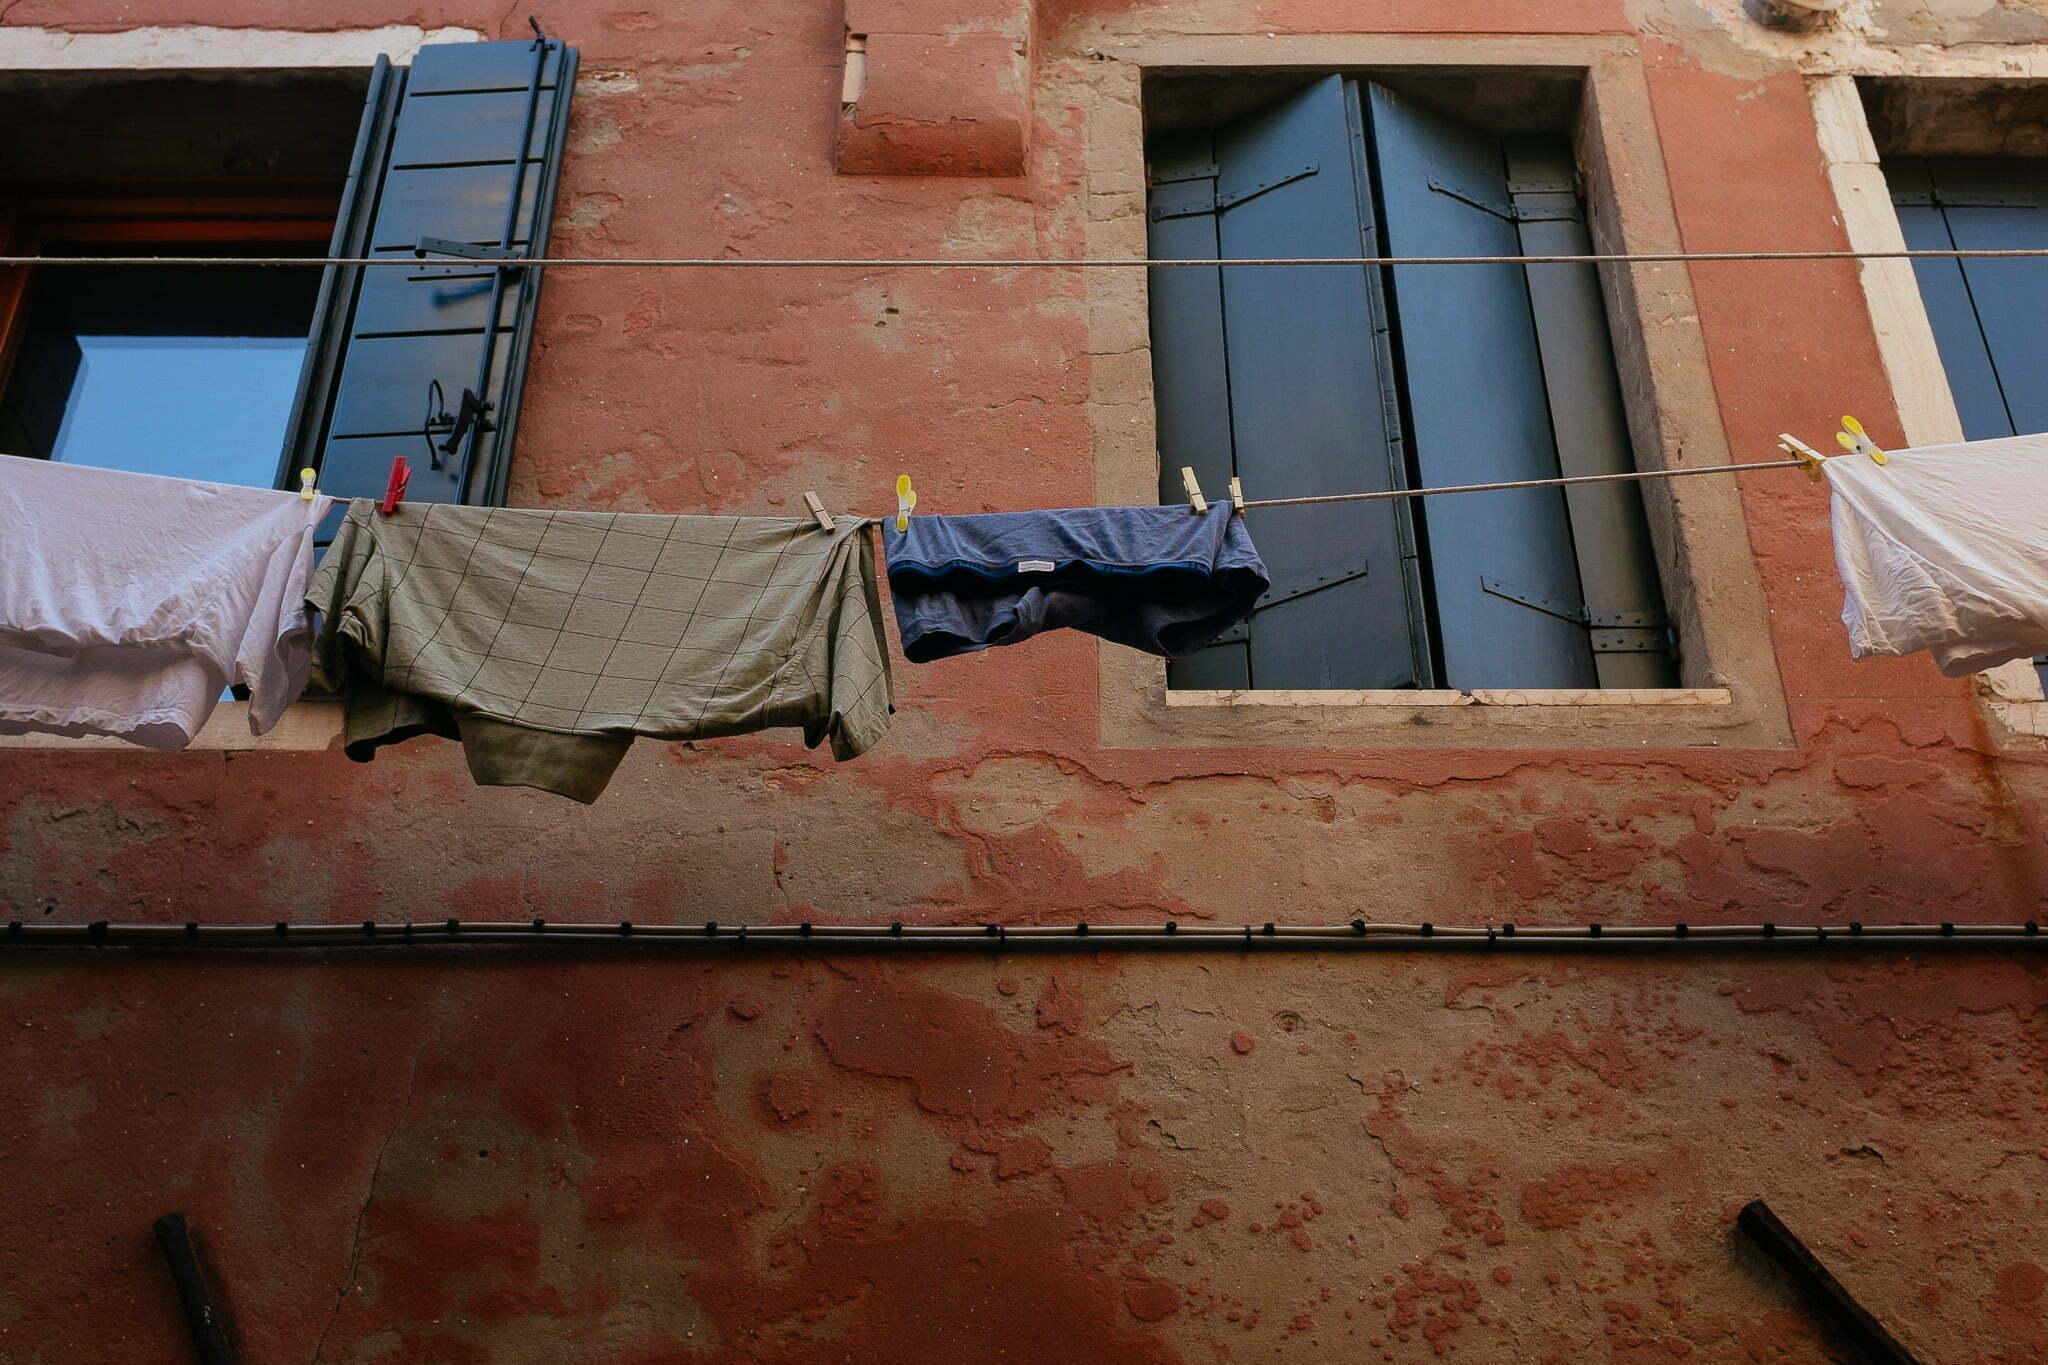 venice-washing-lines-7718